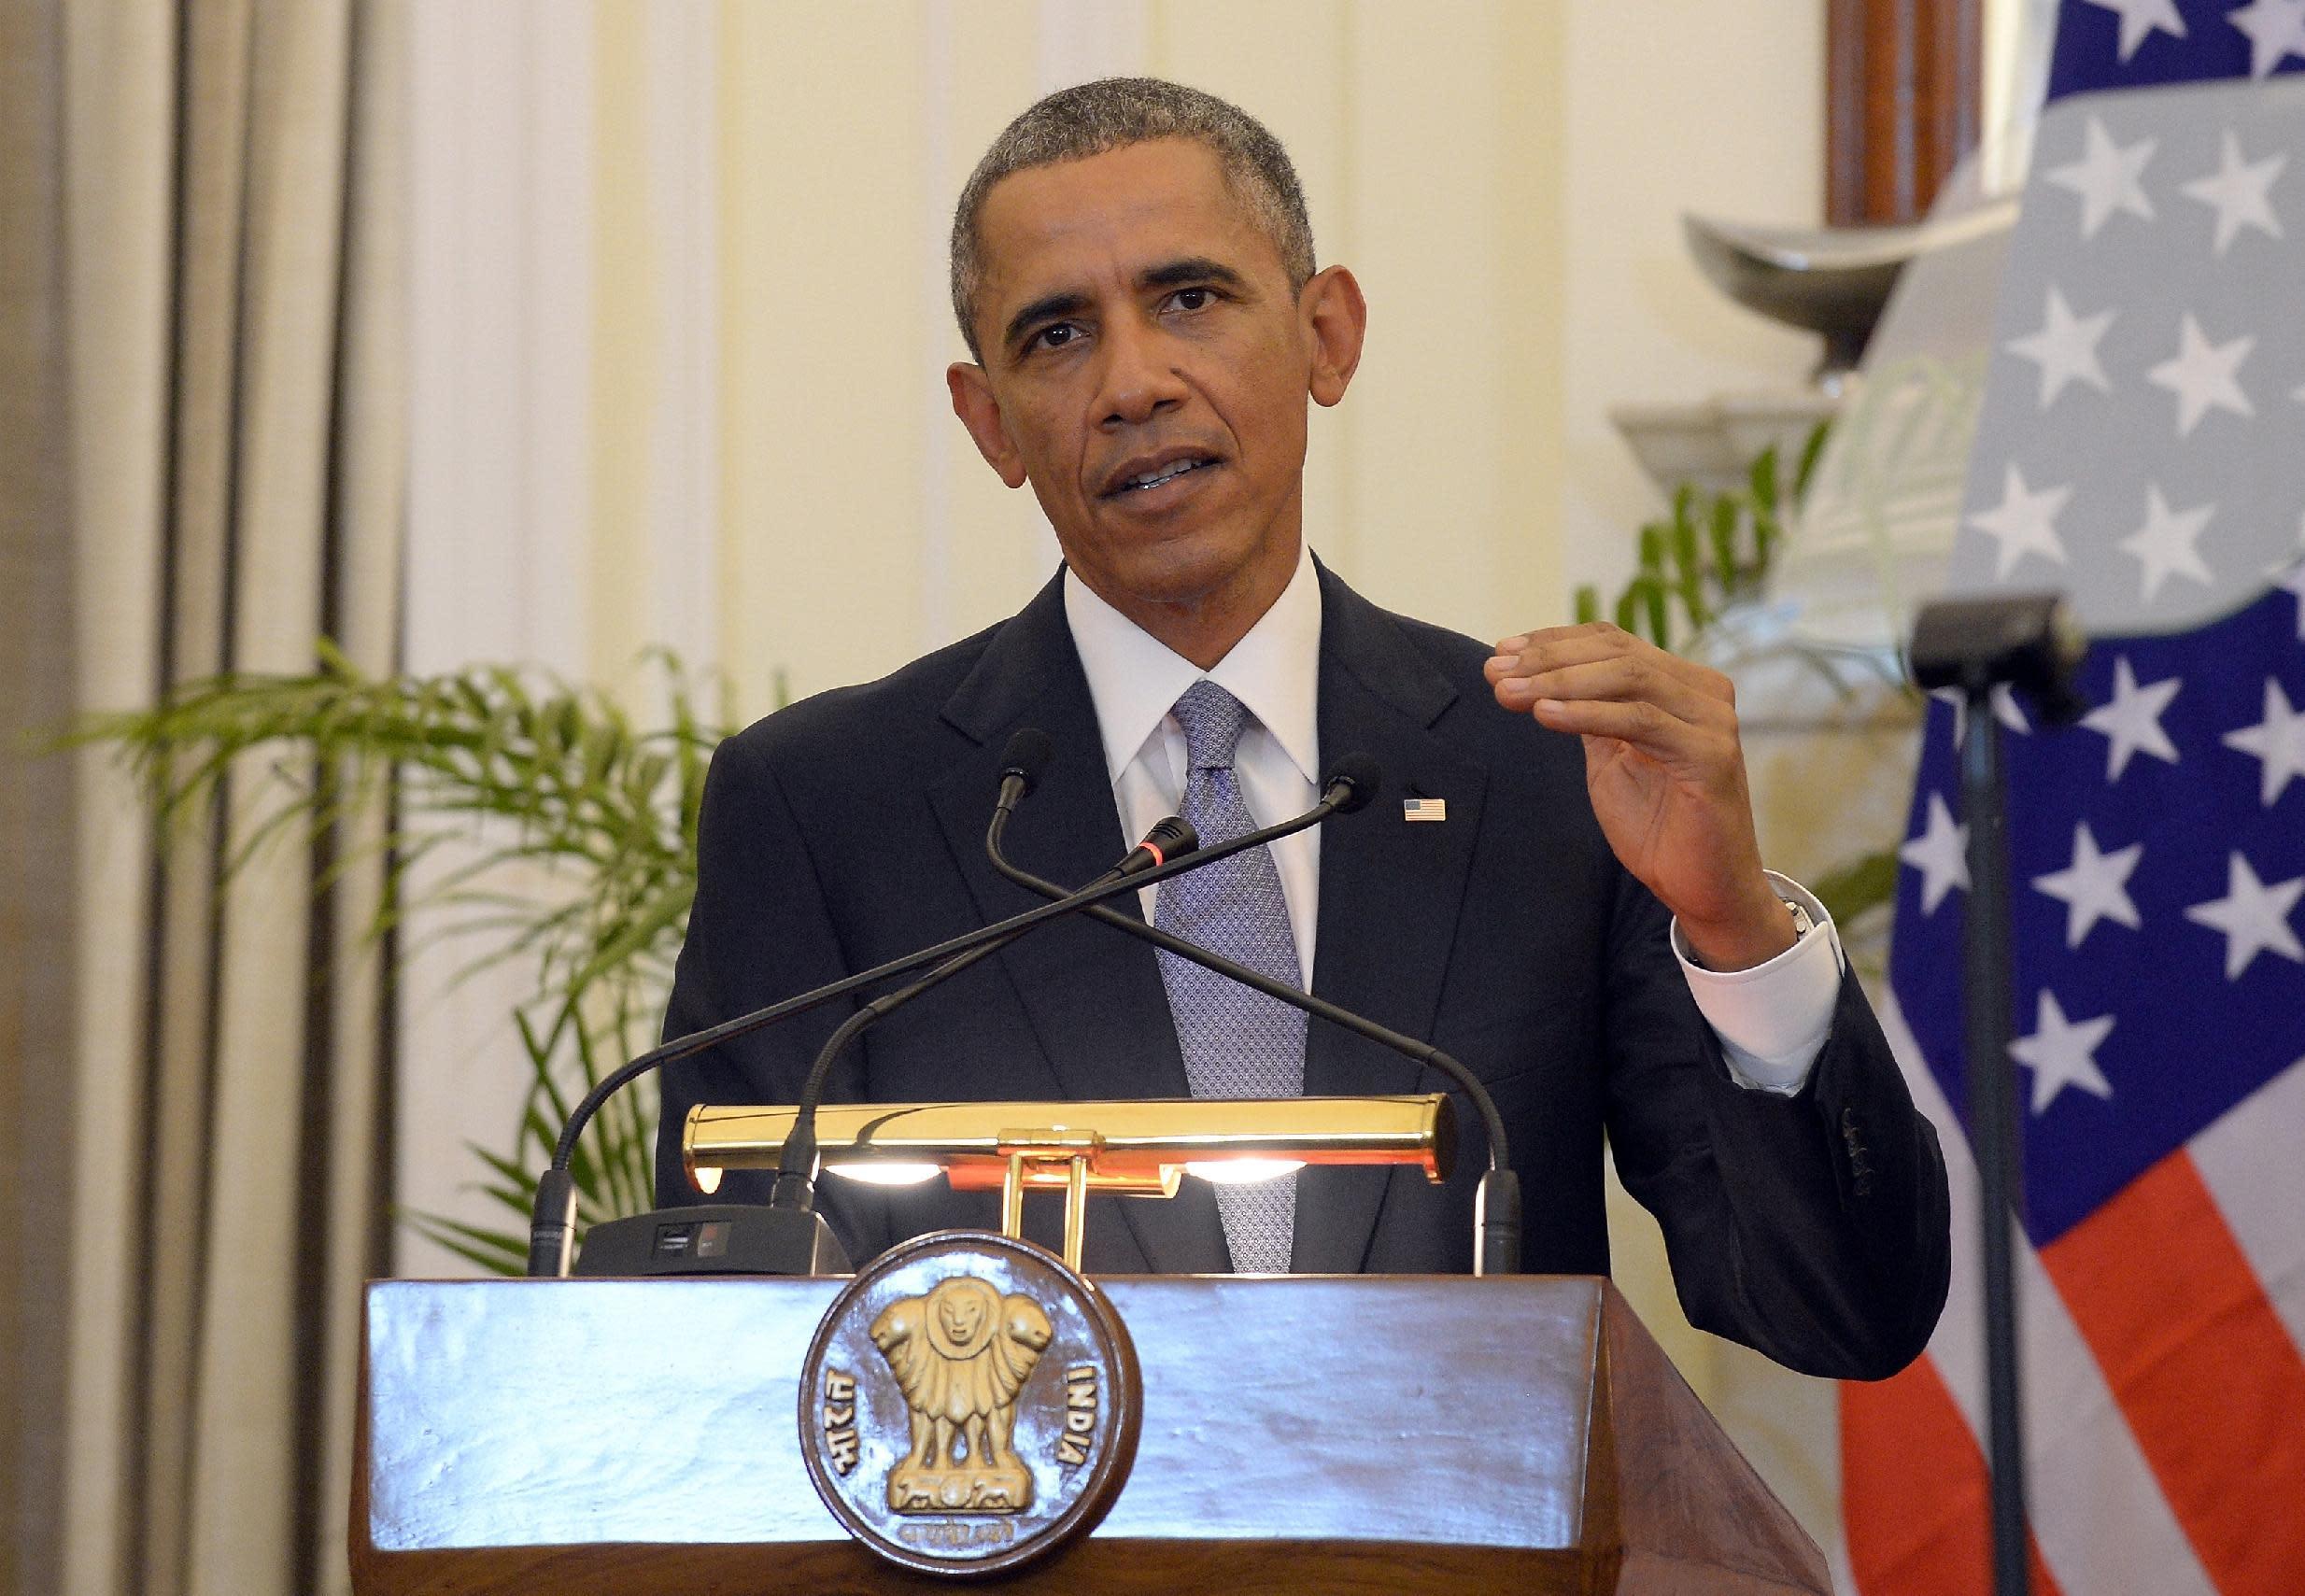 US President Barack Obama addresses the media in New Delhi, India on January 25, 2015 (AFP Photo/Prakash Singh)